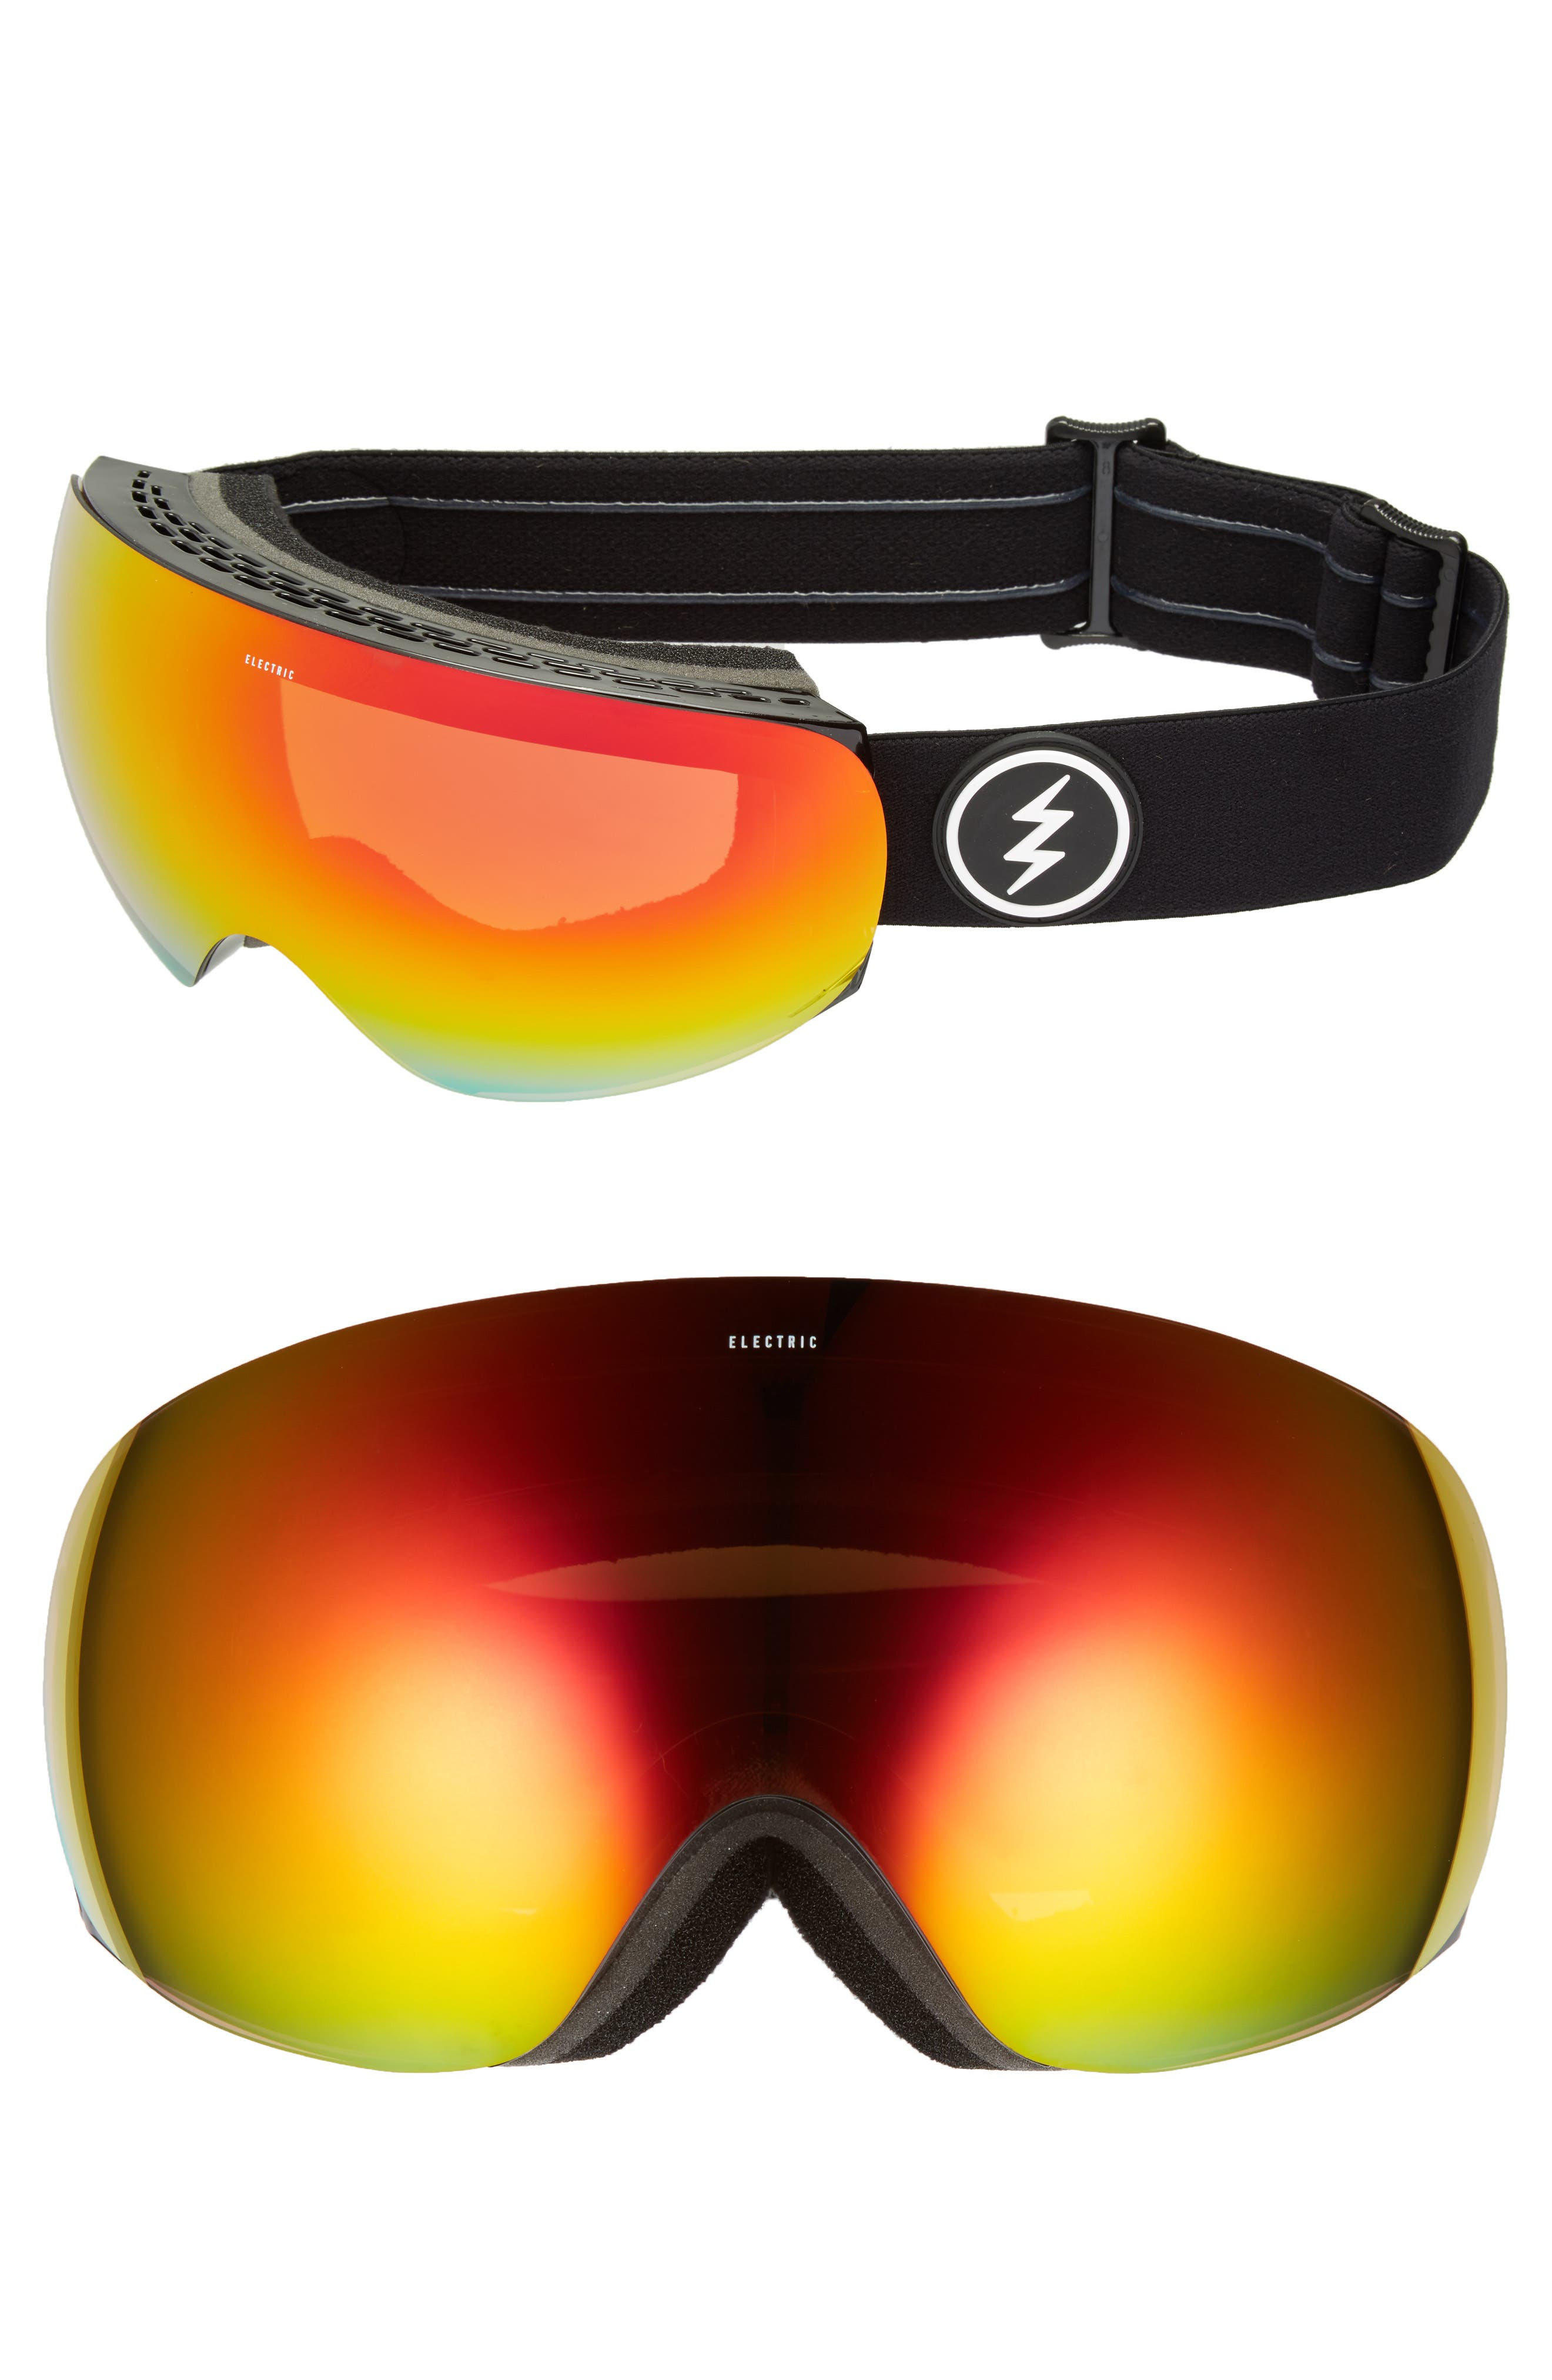 EG3.5 Snow Goggles,                         Main,                         color,